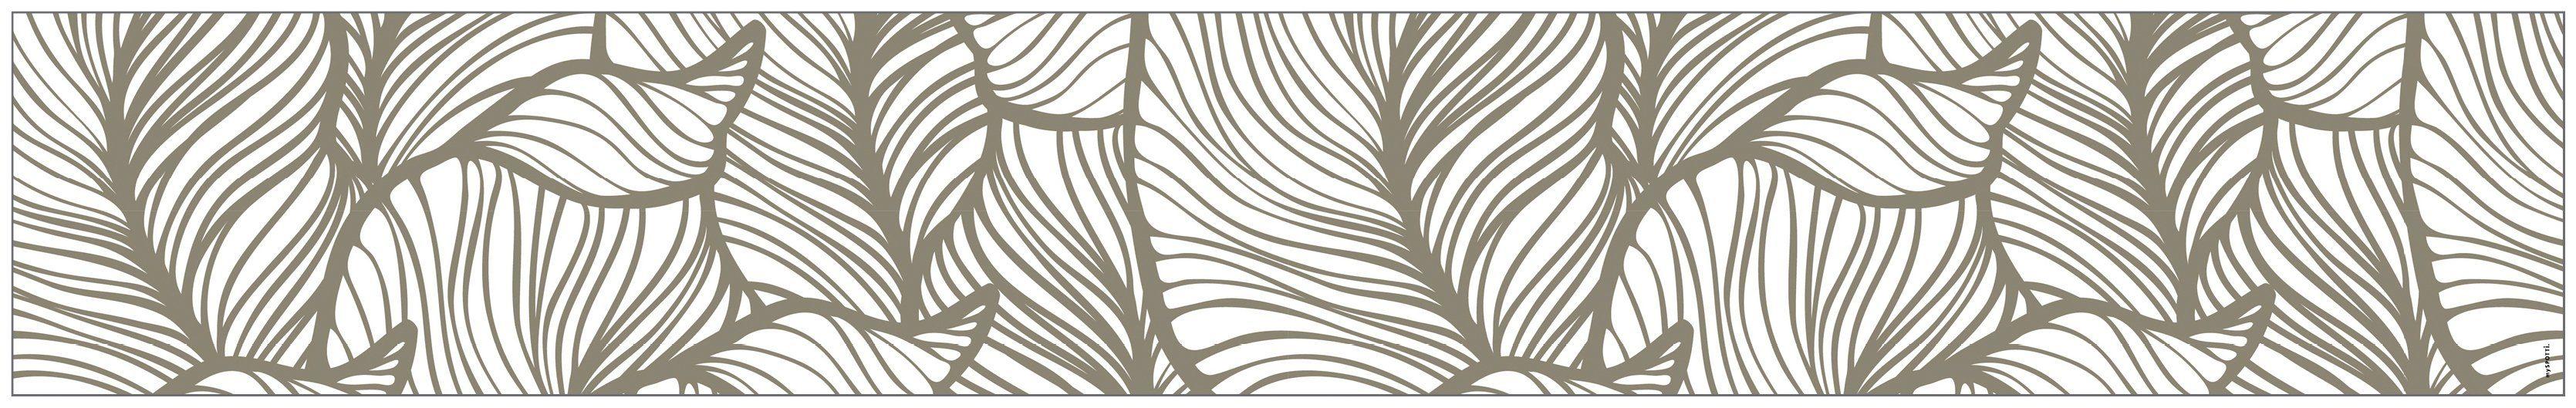 MYSPOTTI Fensterfolie »mySPOTTI look Leaves beige«, 200 x 30 cm, statisch haftend